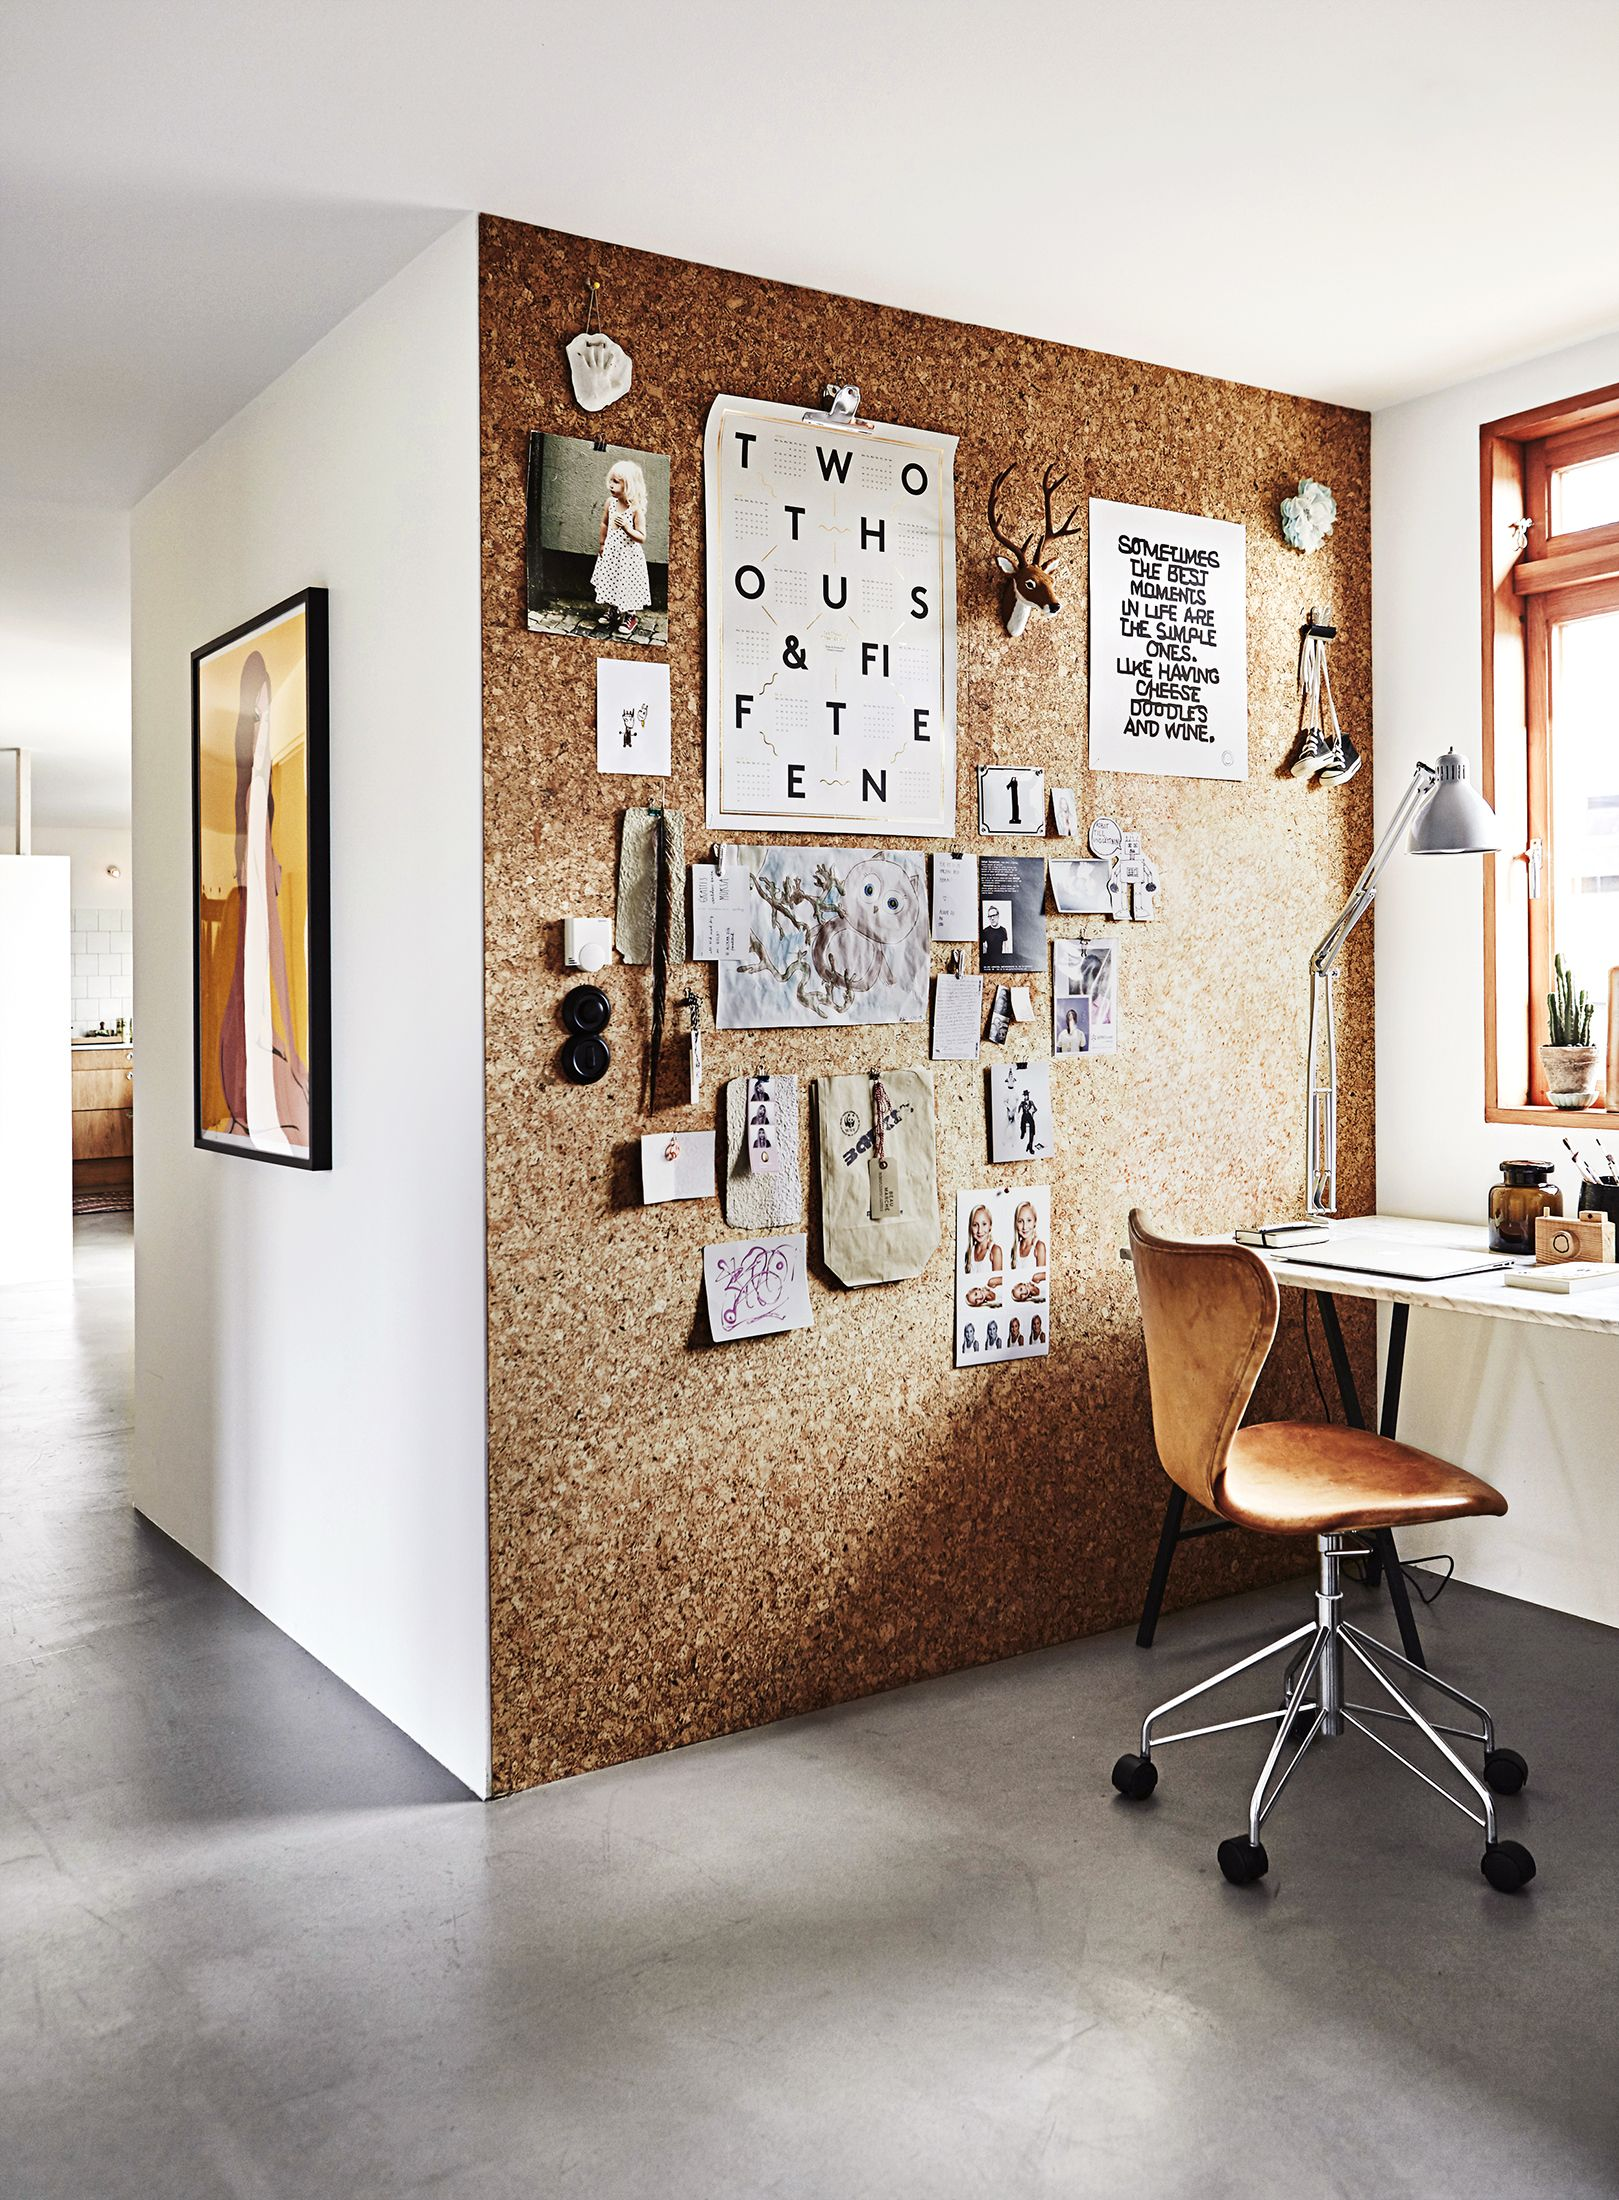 11 DIY Wall Decor Ideas for Any Room - Cute and Cheap DIY Wall